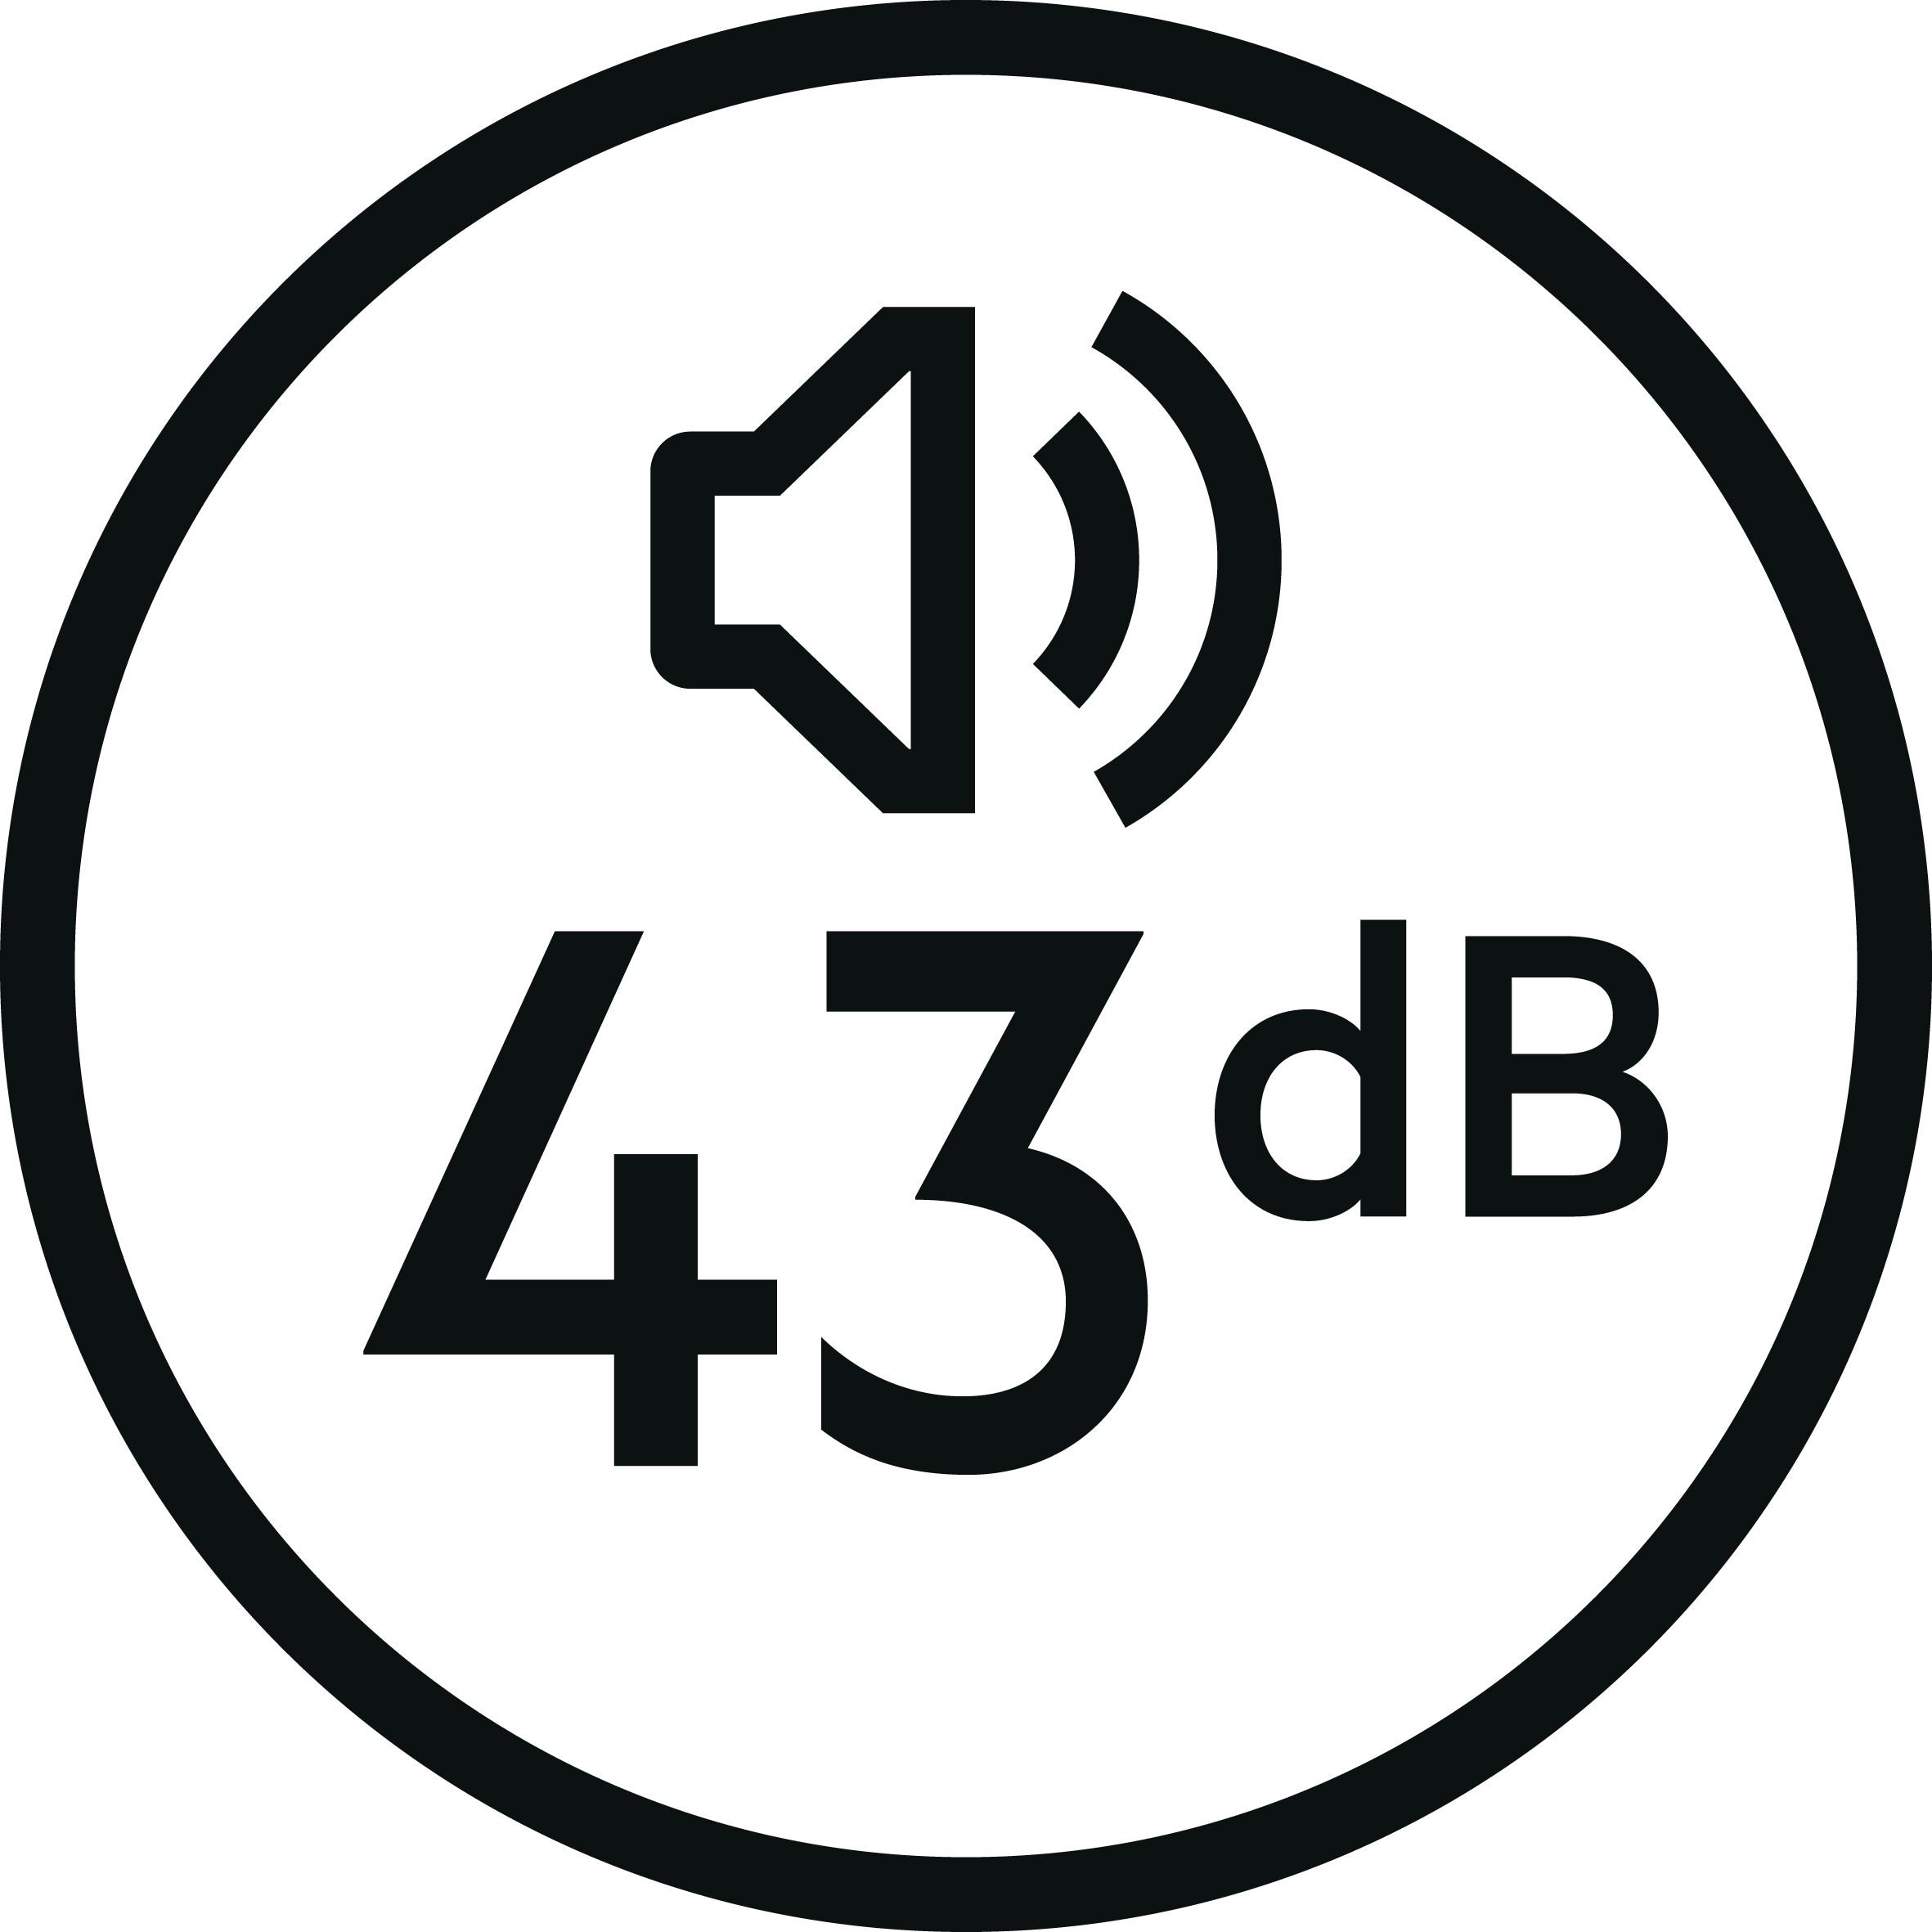 43dB-PSAAAP16PC569048.jpg